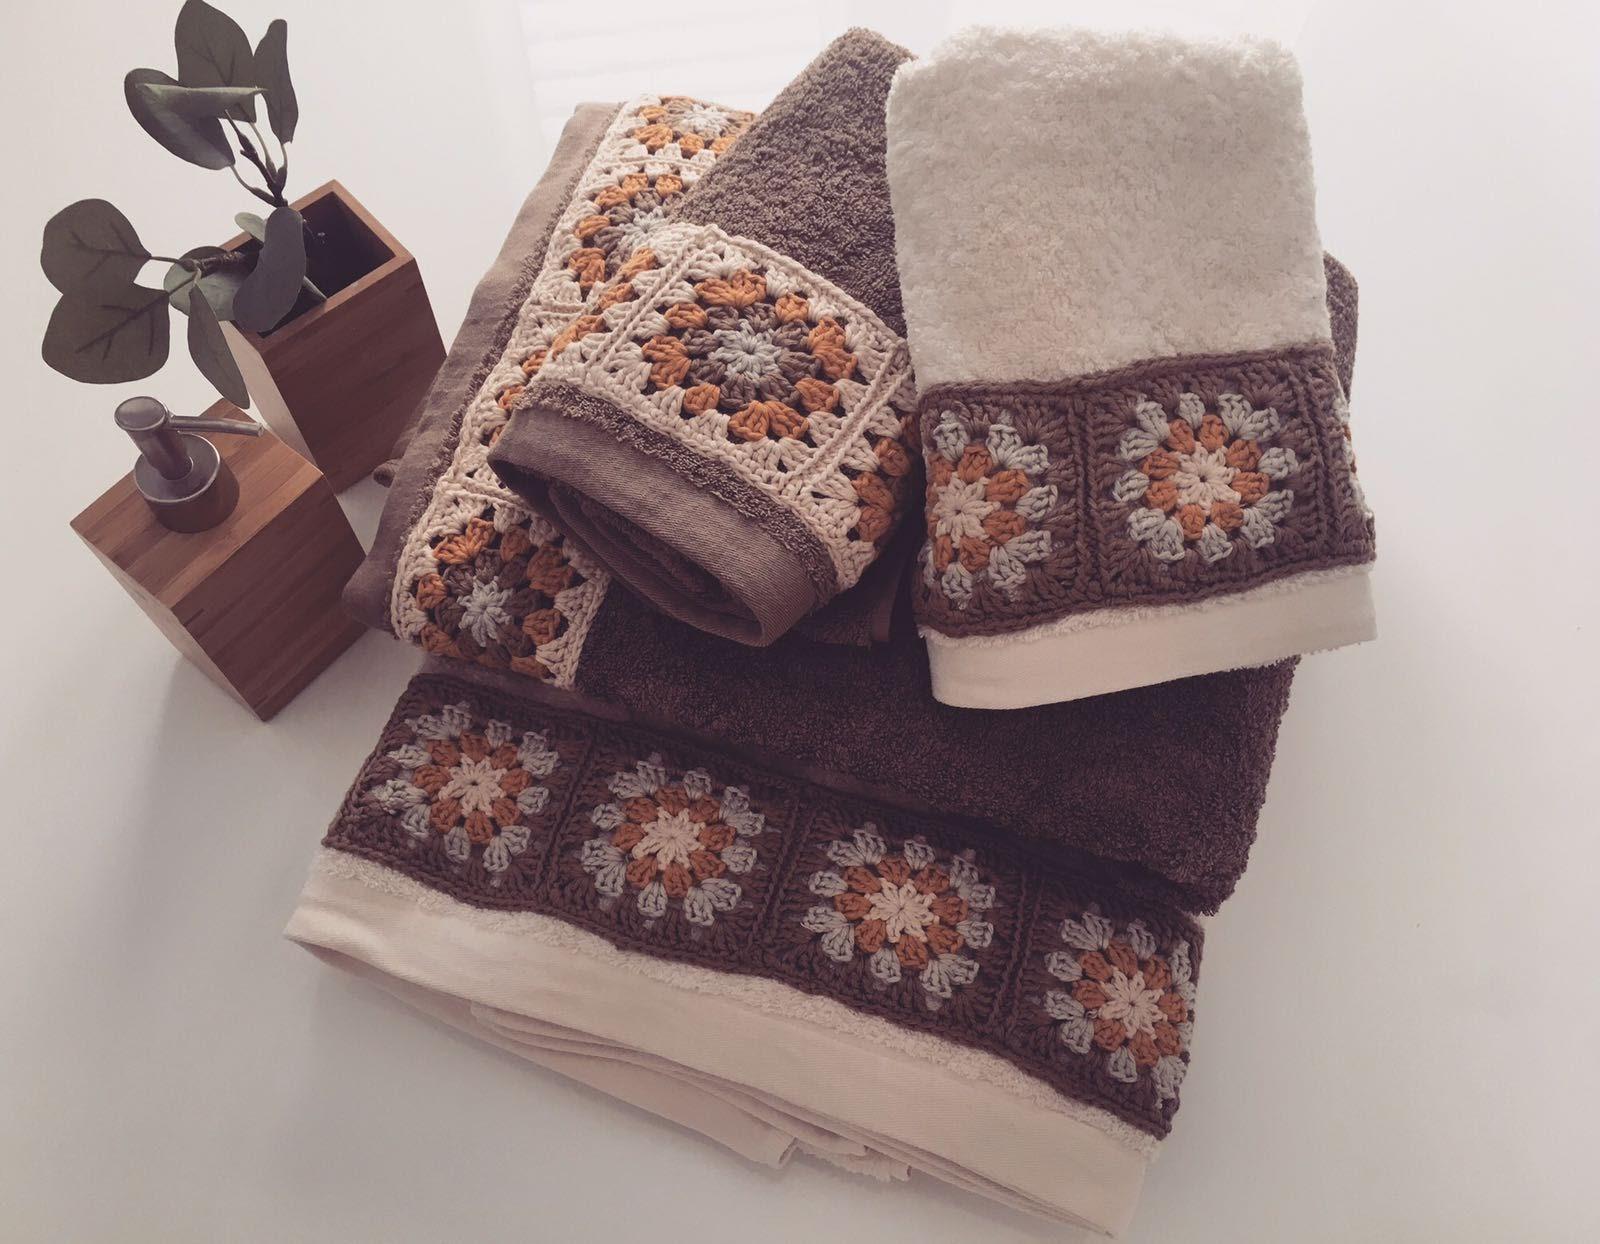 Patronhila Toallas Decoradas Con Granny Square Tutorial - Decoracion-con-toallas